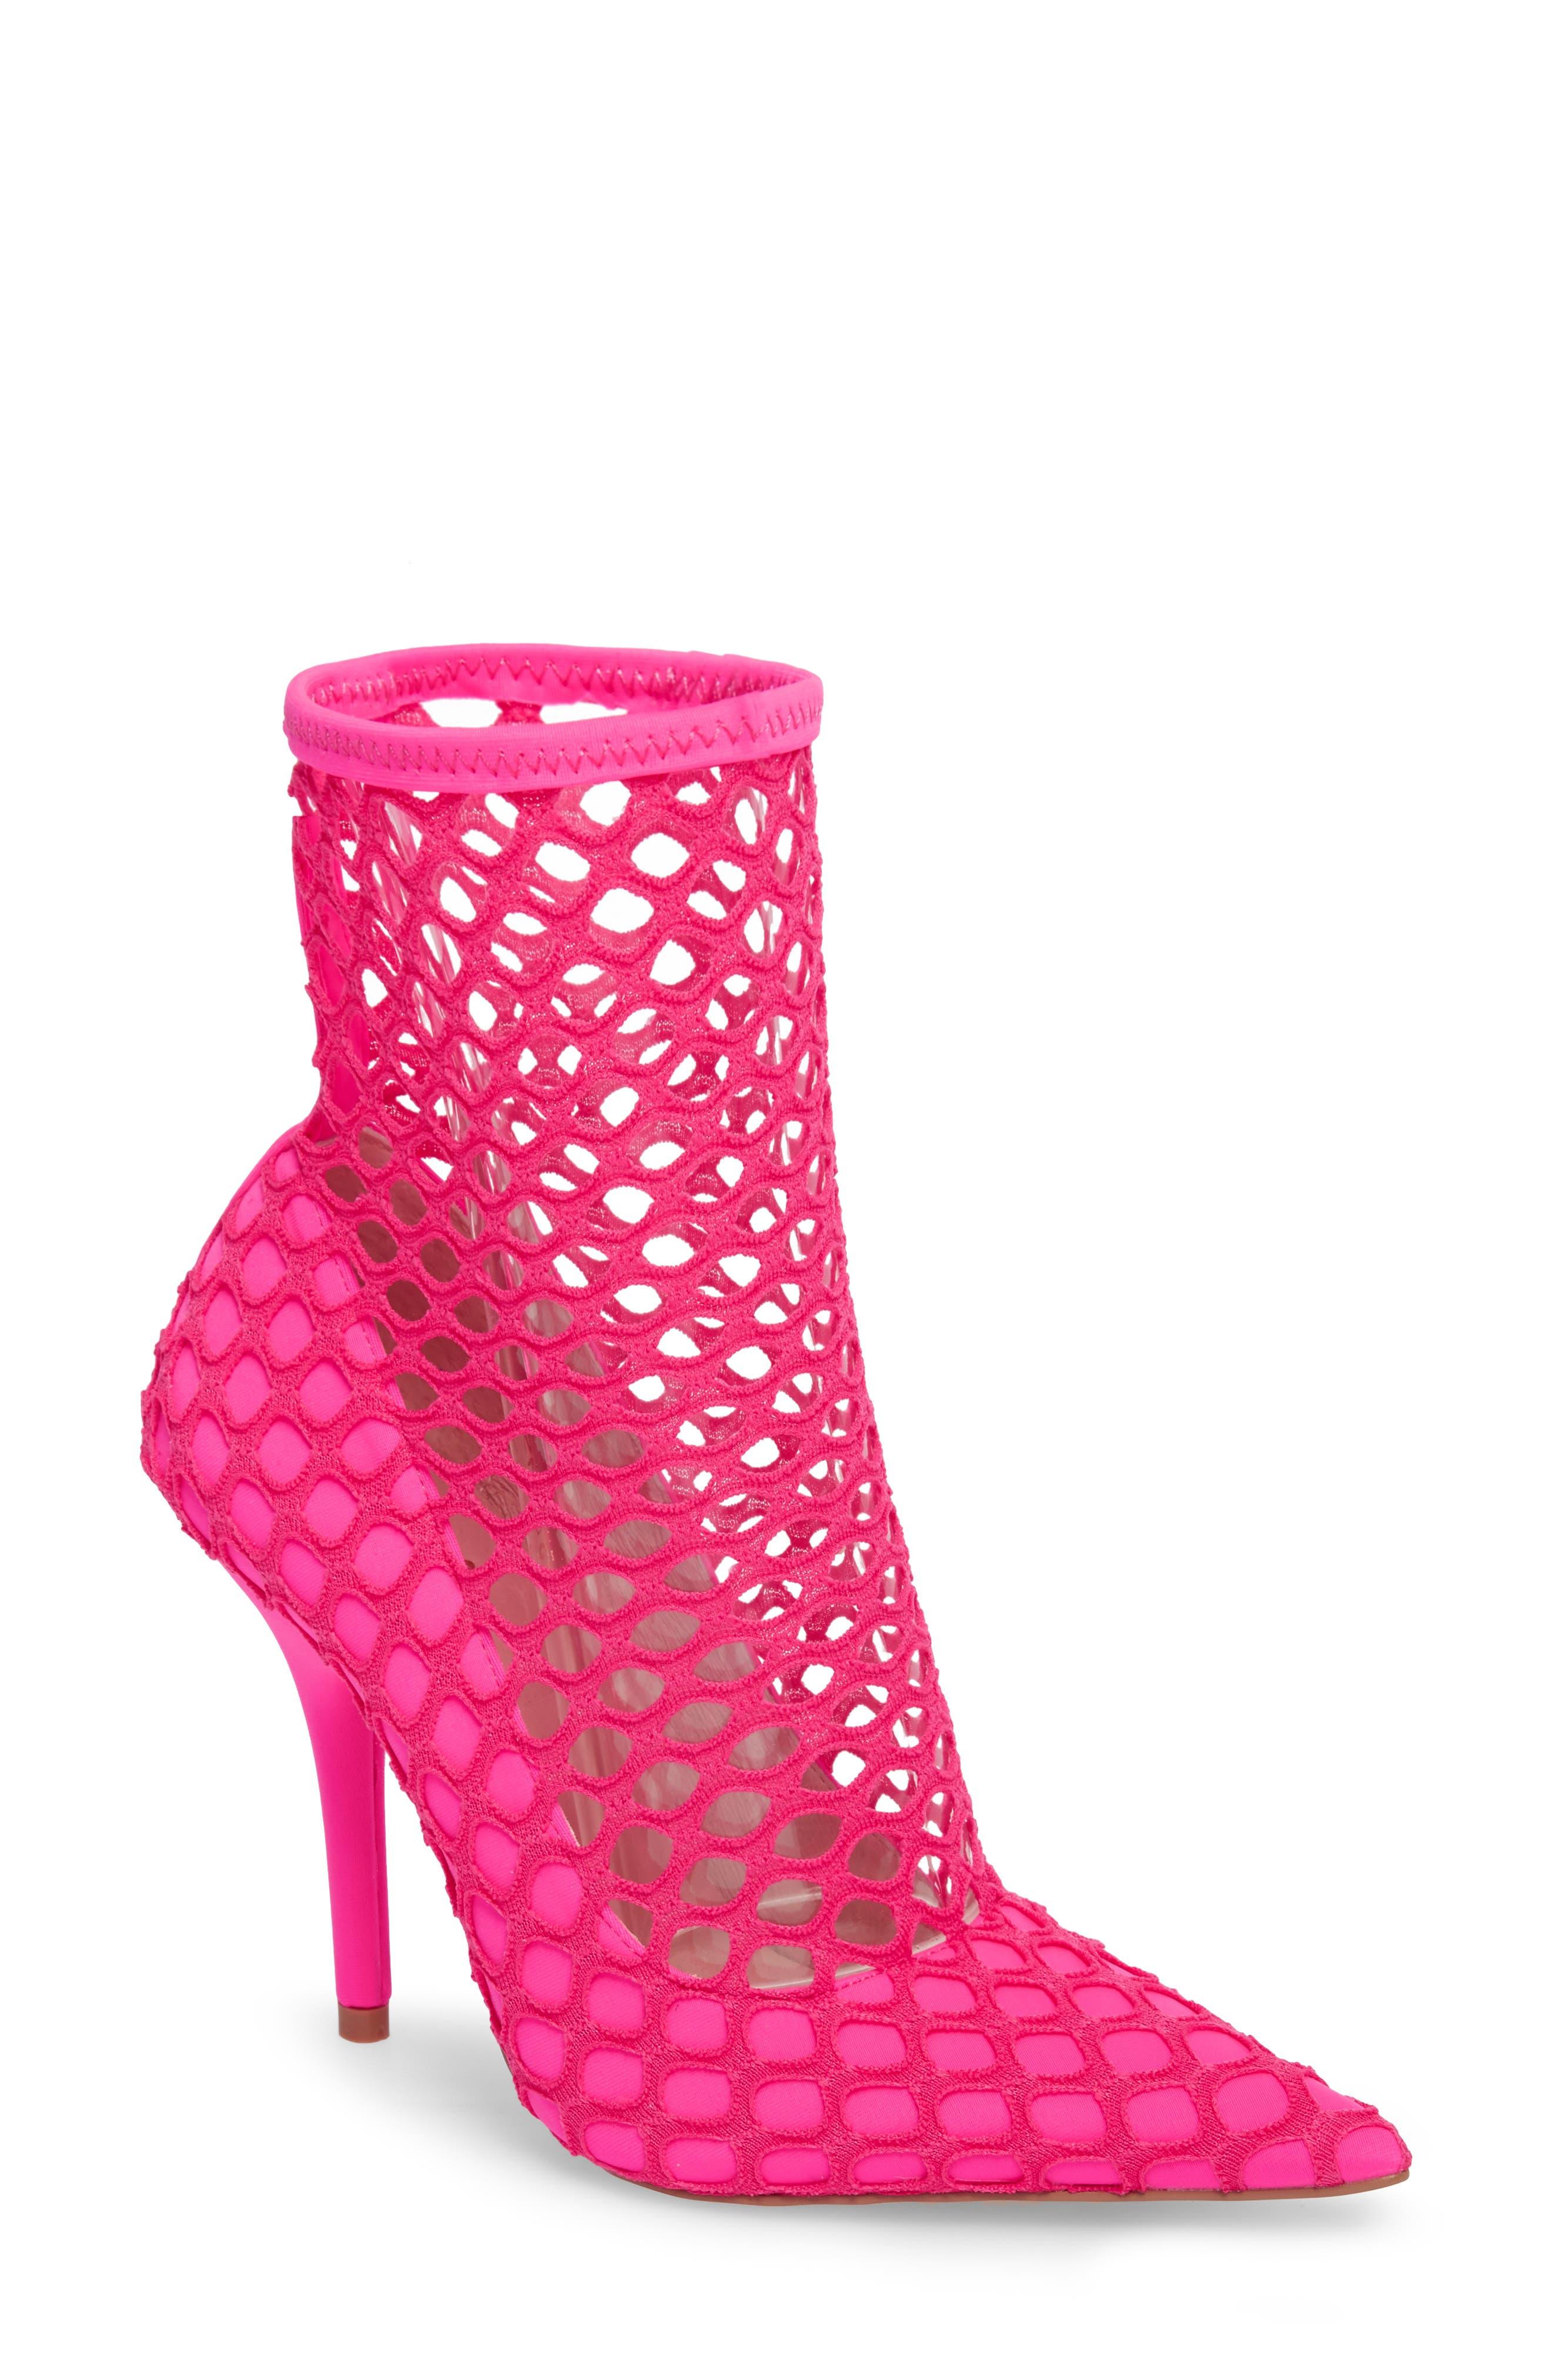 Heidi Mesh Sock Bootie,                         Main,                         color, Neon Pink Fabric